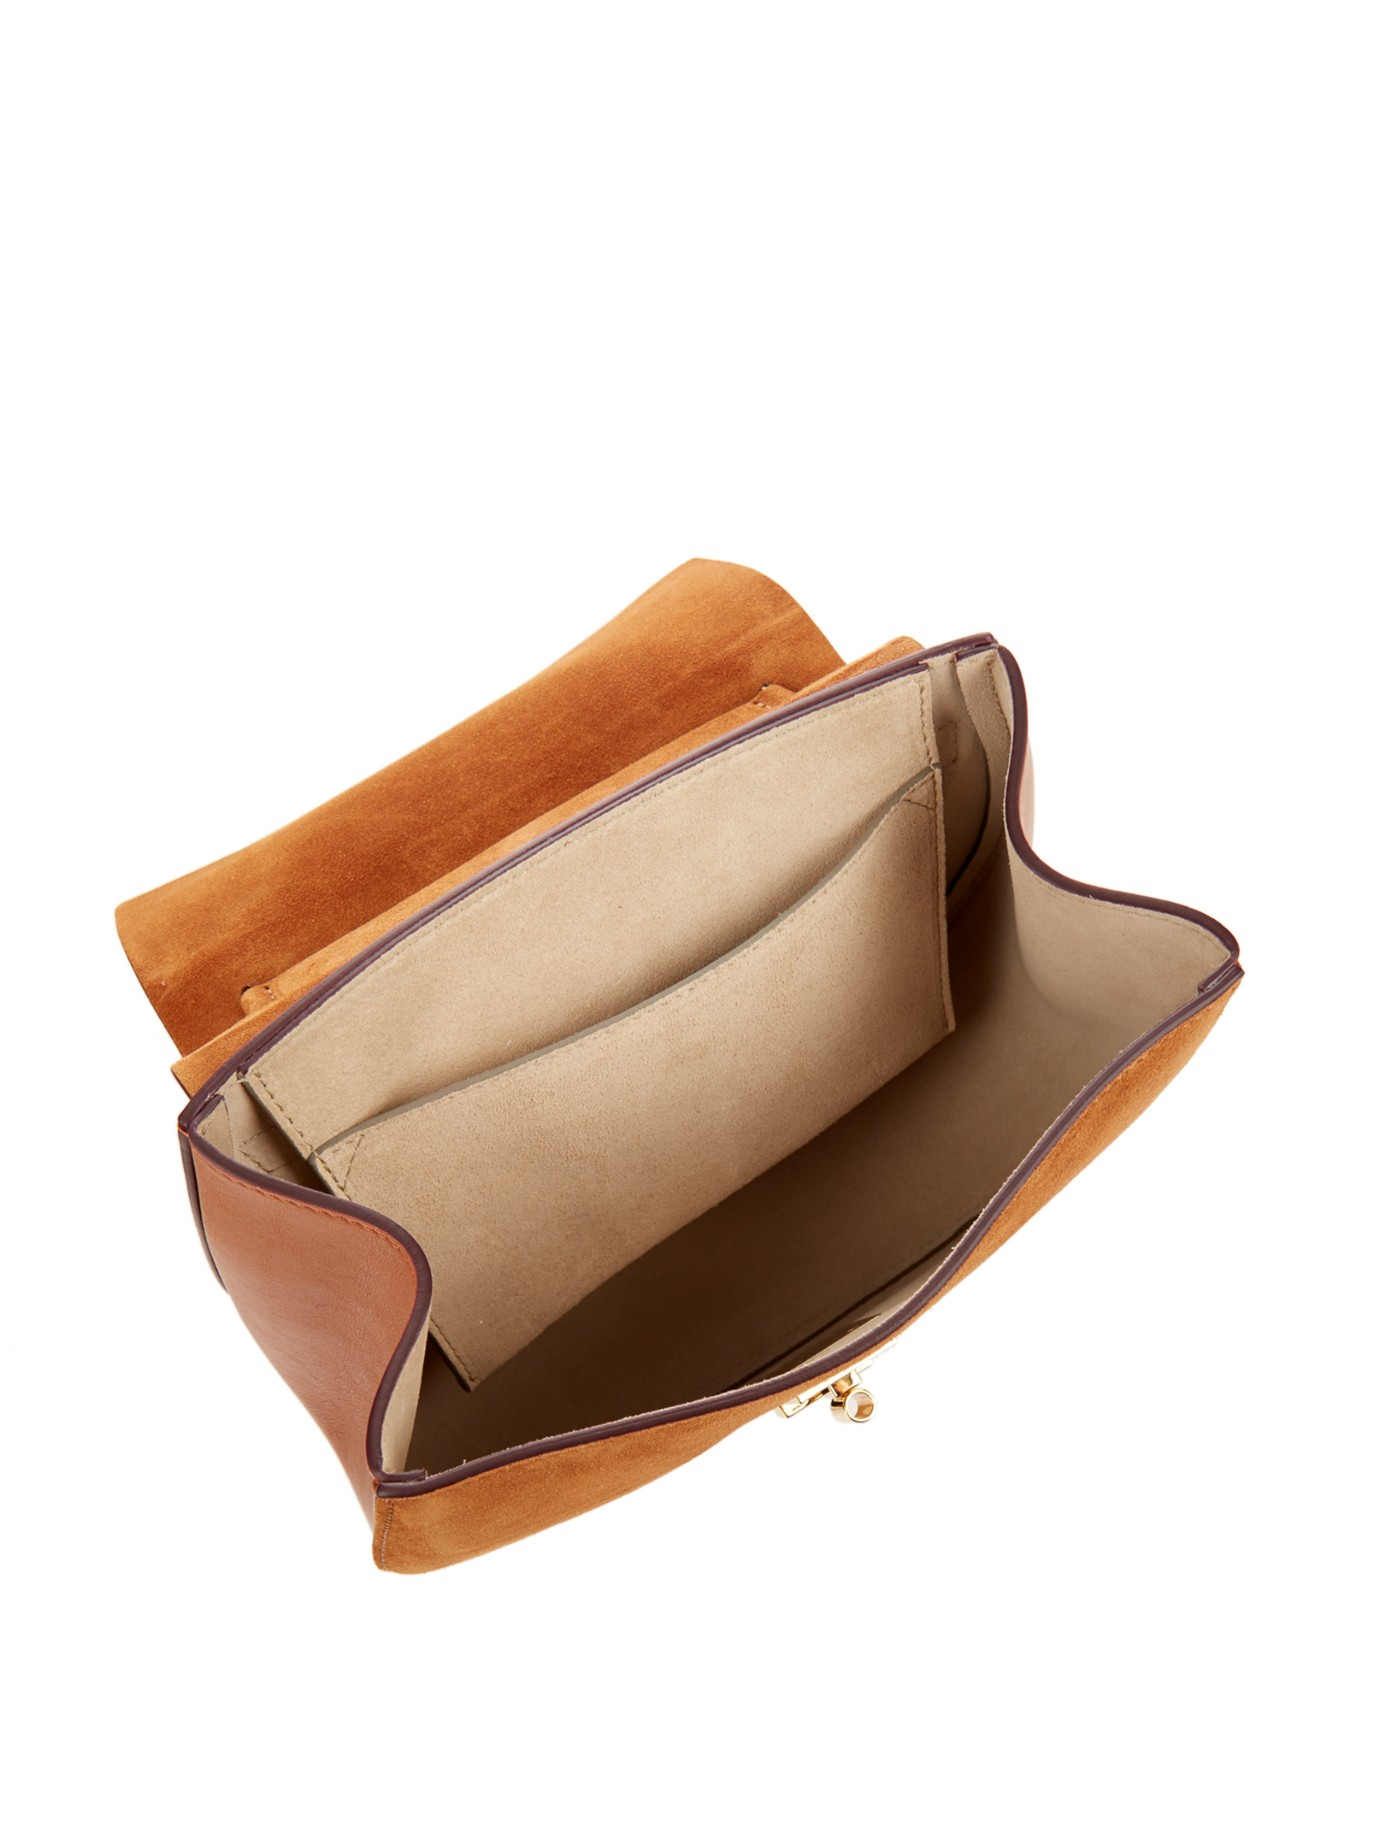 chloe wallets and purses - chloe drew small suede cross-body bag, chloe bag